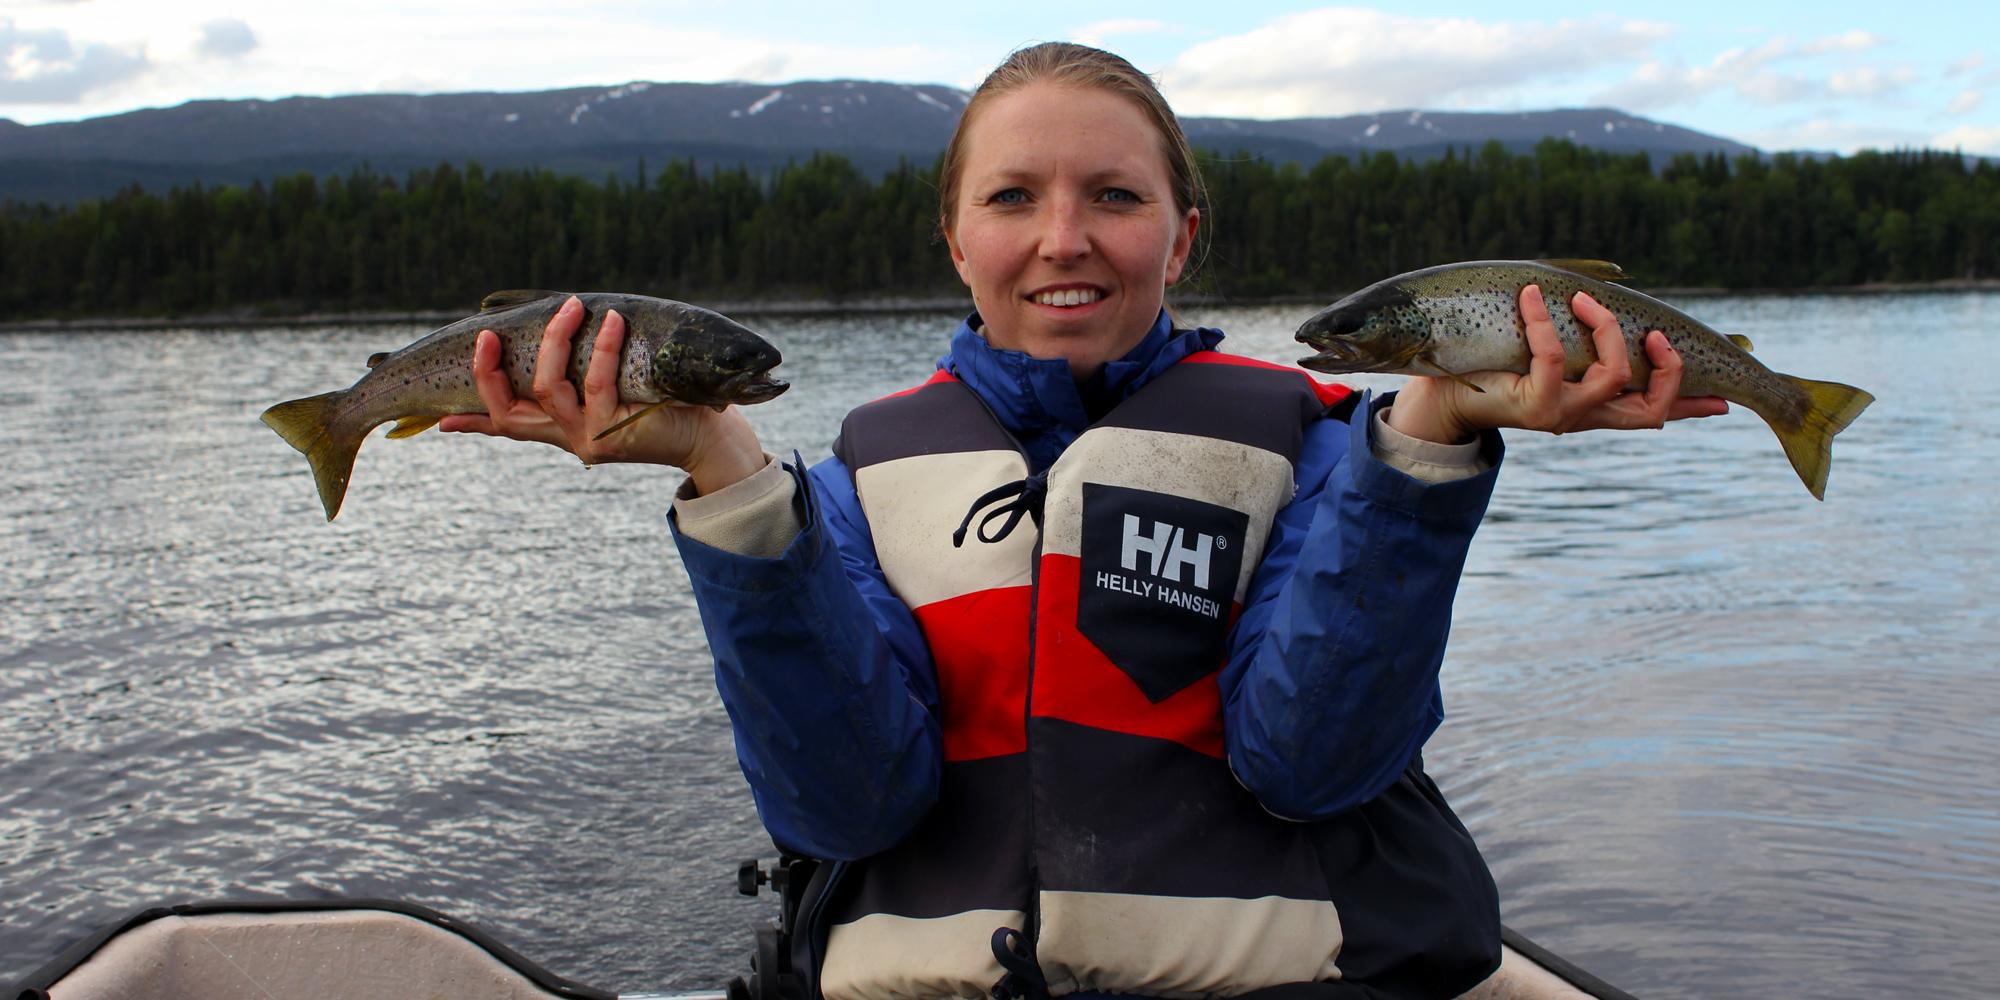 Christine med fiskefangst på Snåsavatnet. Copyright: Visit Innherred